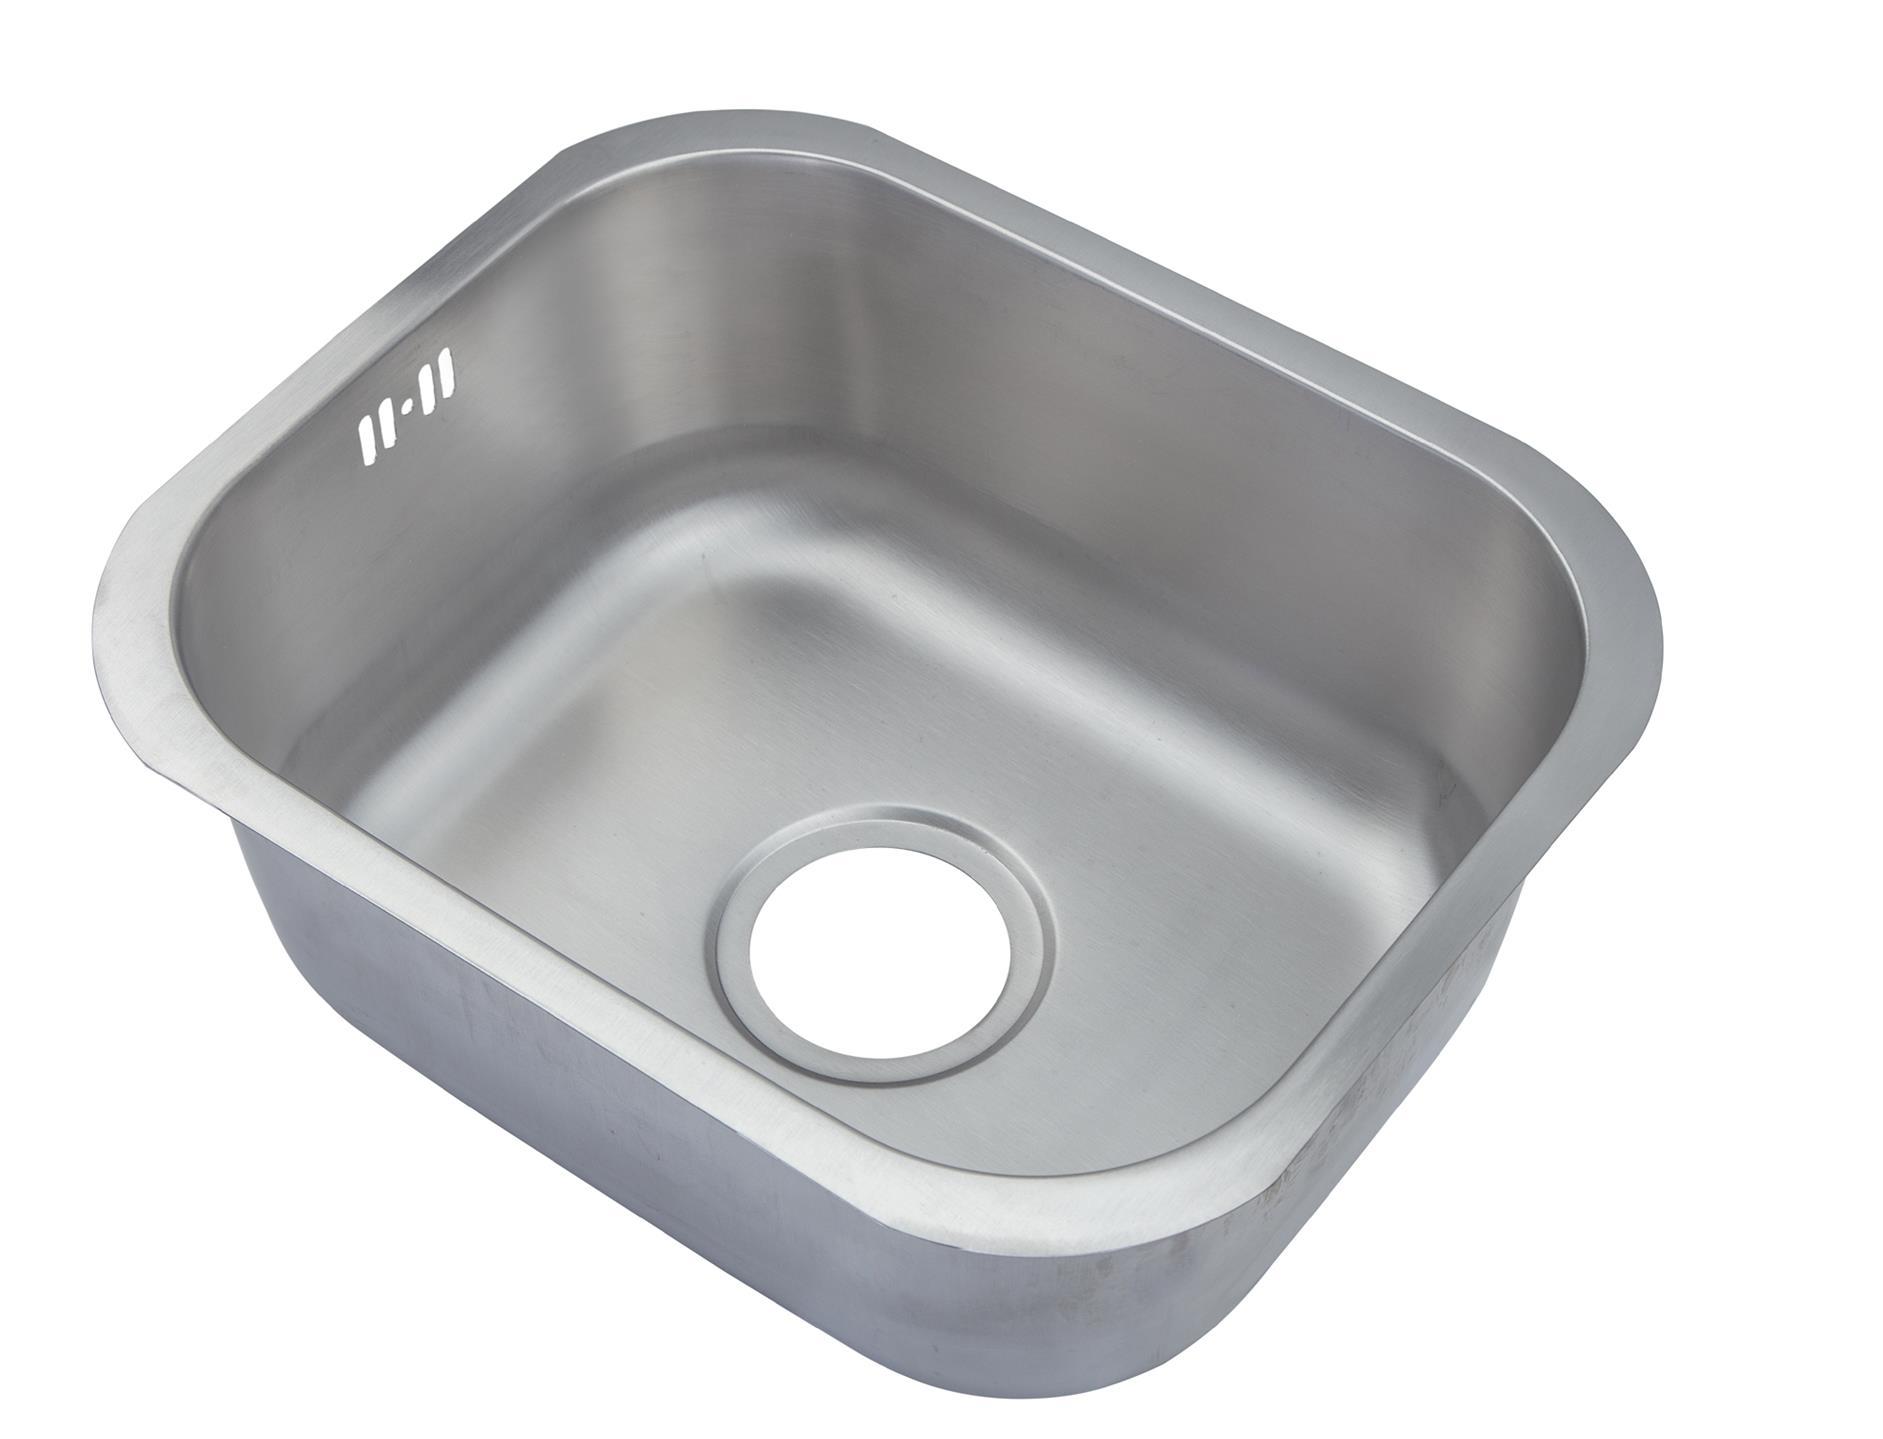 Stainless Steel Sinks Ebay : Discounted Stainless Steel Undermout Kitchen Sink eBay